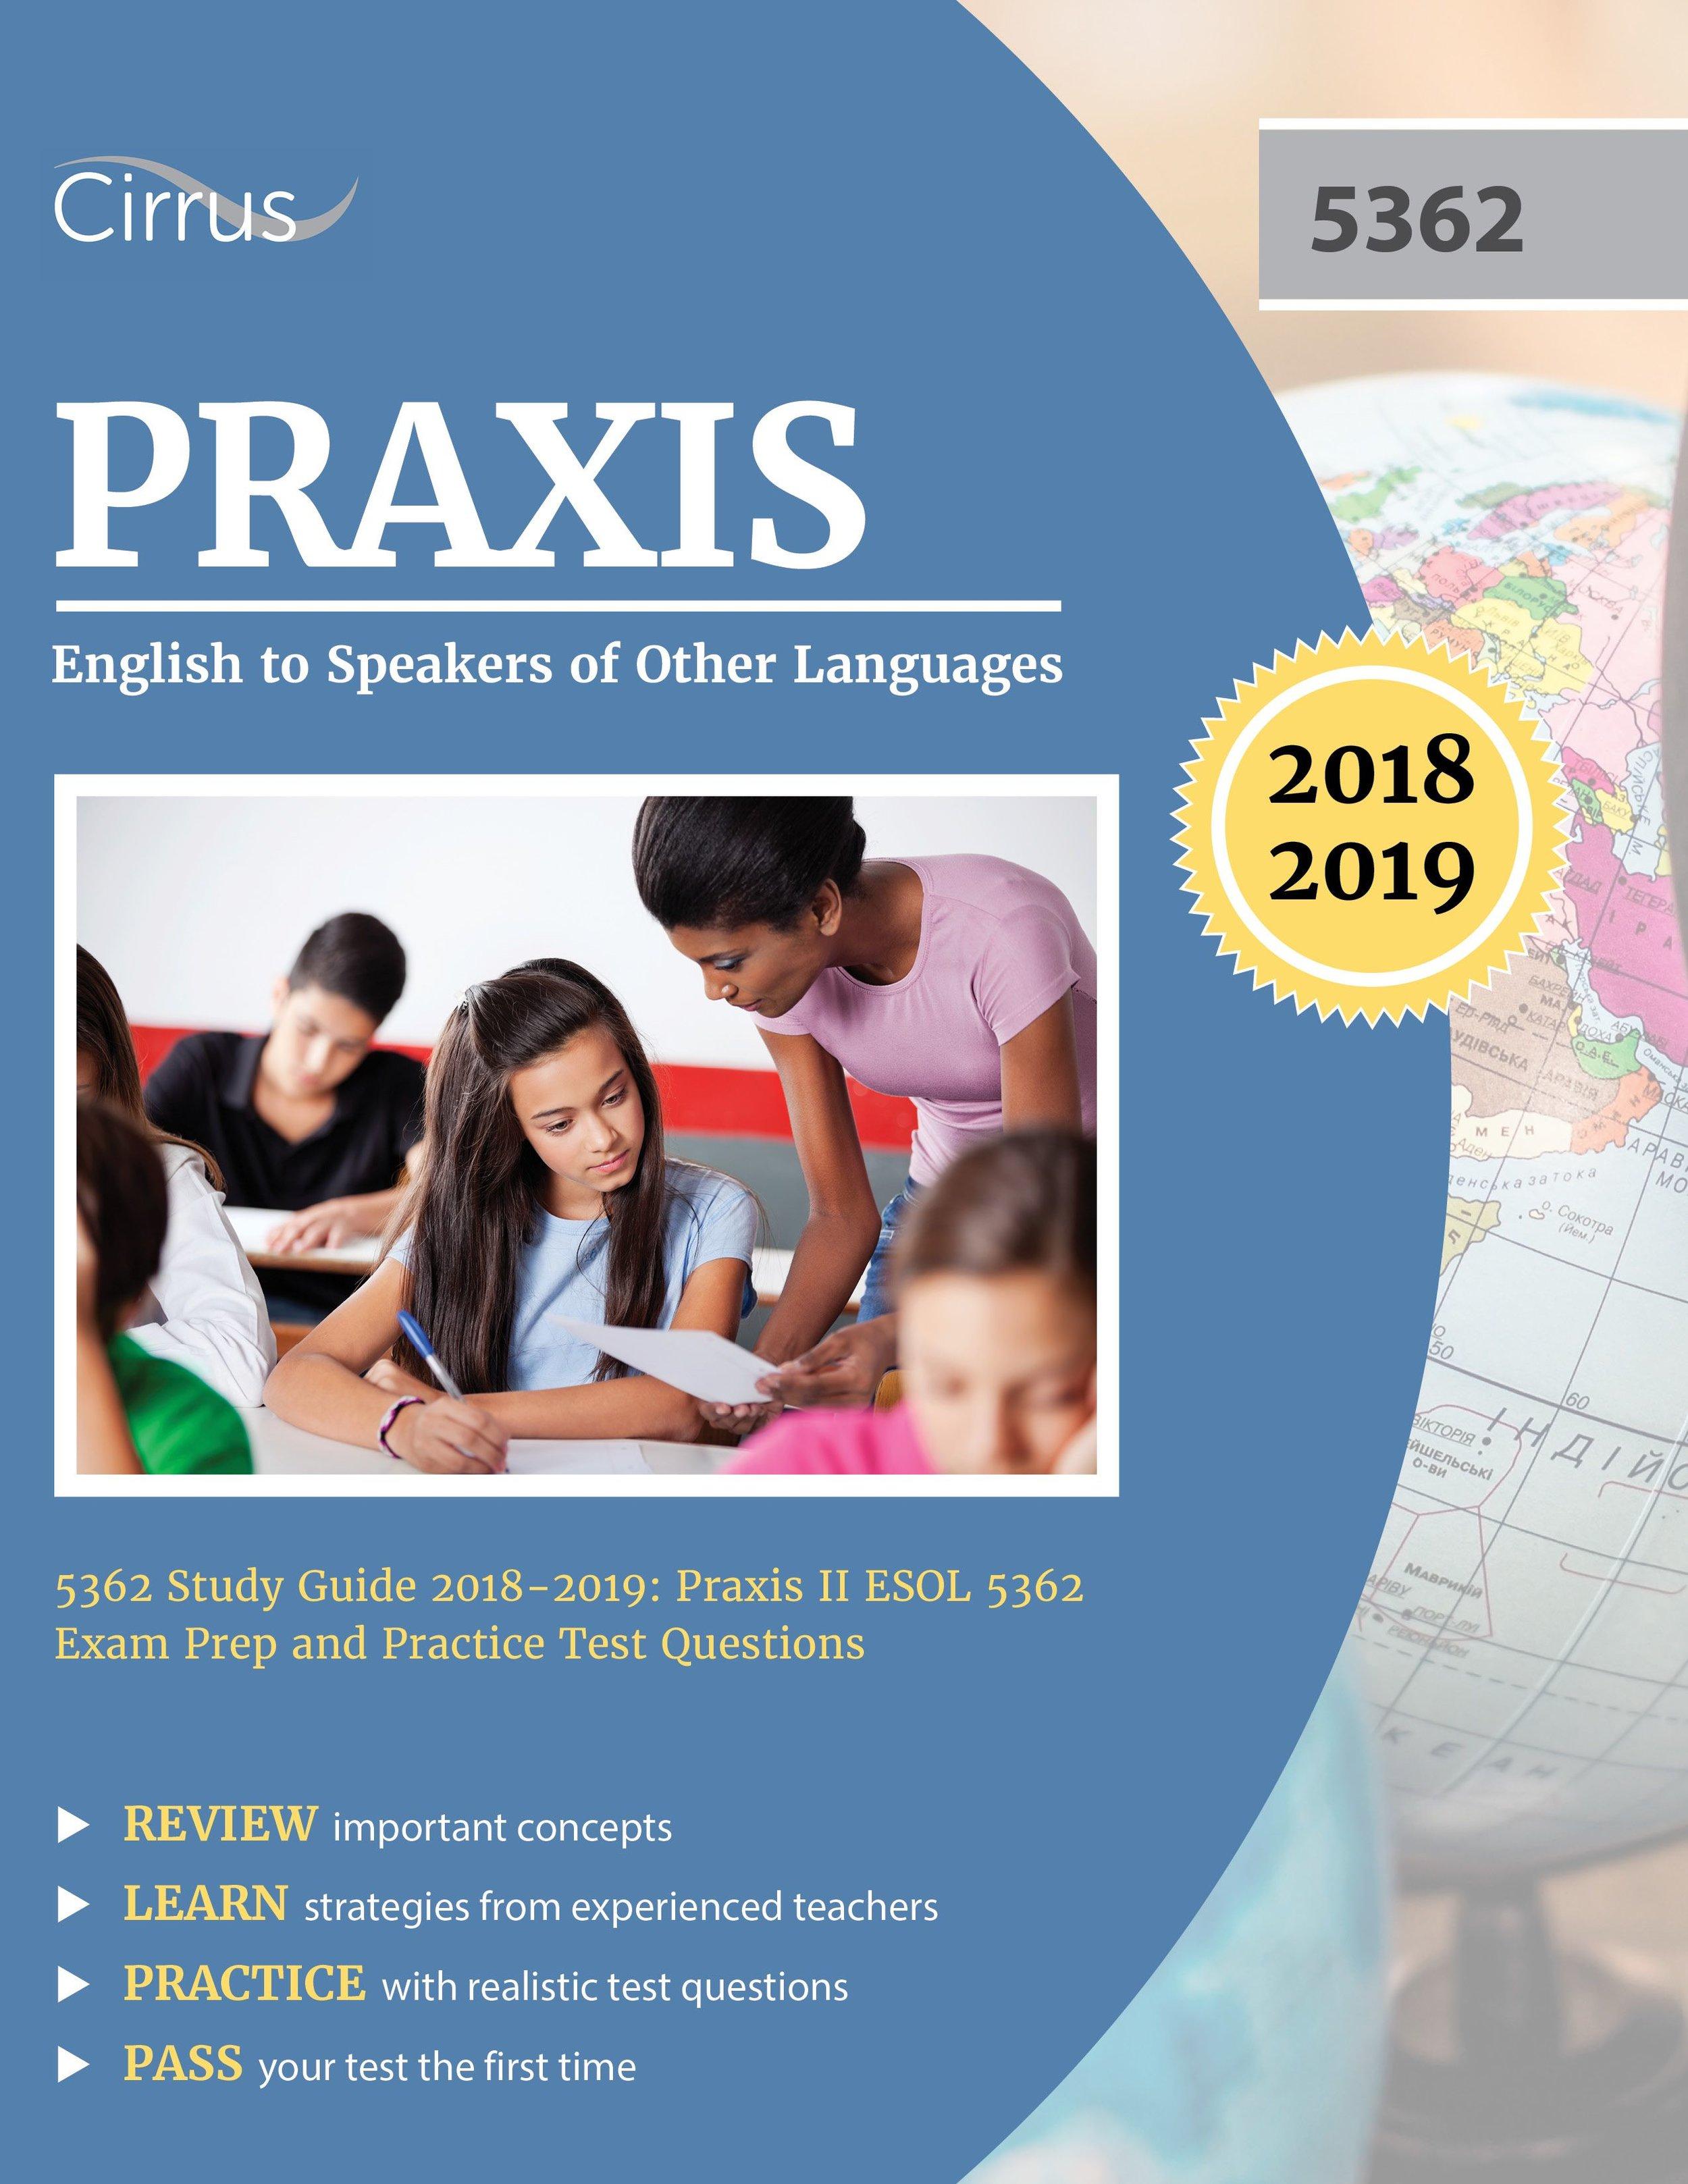 Praxis ESOL 5362 Study Guide 2018 – 2019